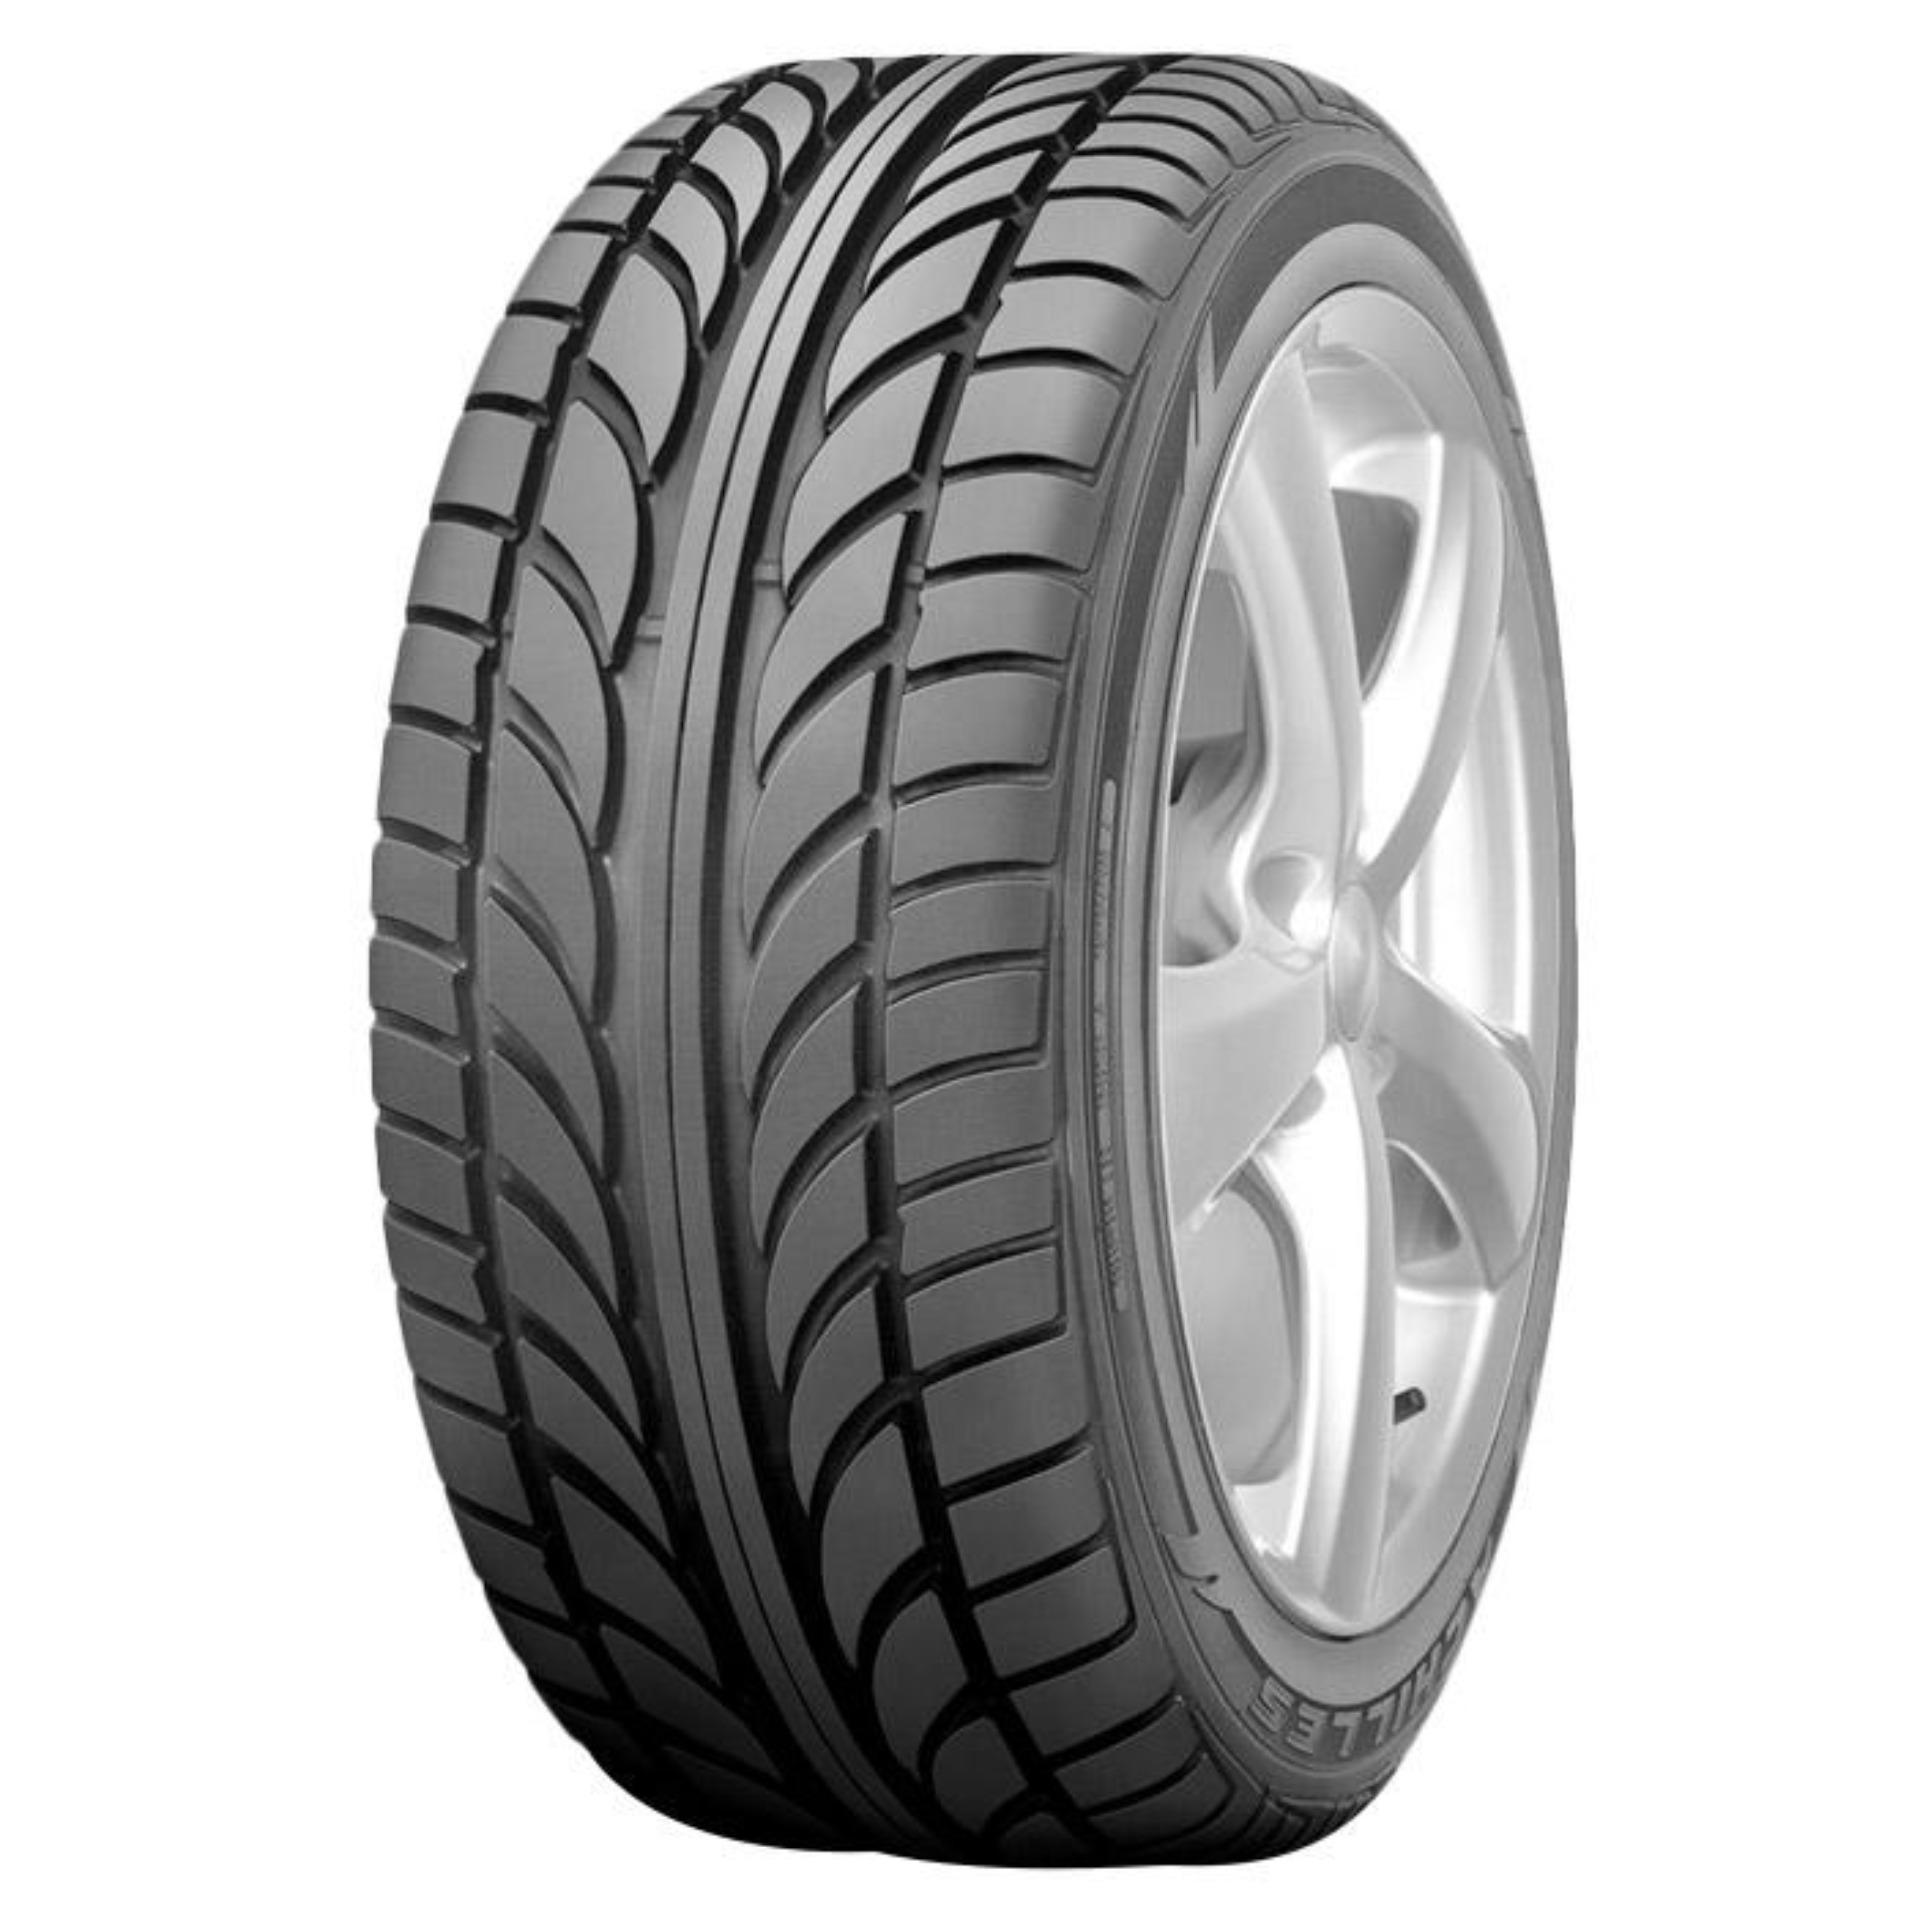 Bridgestone Ecopia Ep150 195 65 R15 Ban Mobil Gratis Kirim Jawa New Techno Tecaz 185 60r15 Vocer Achilles Atr Sport 55